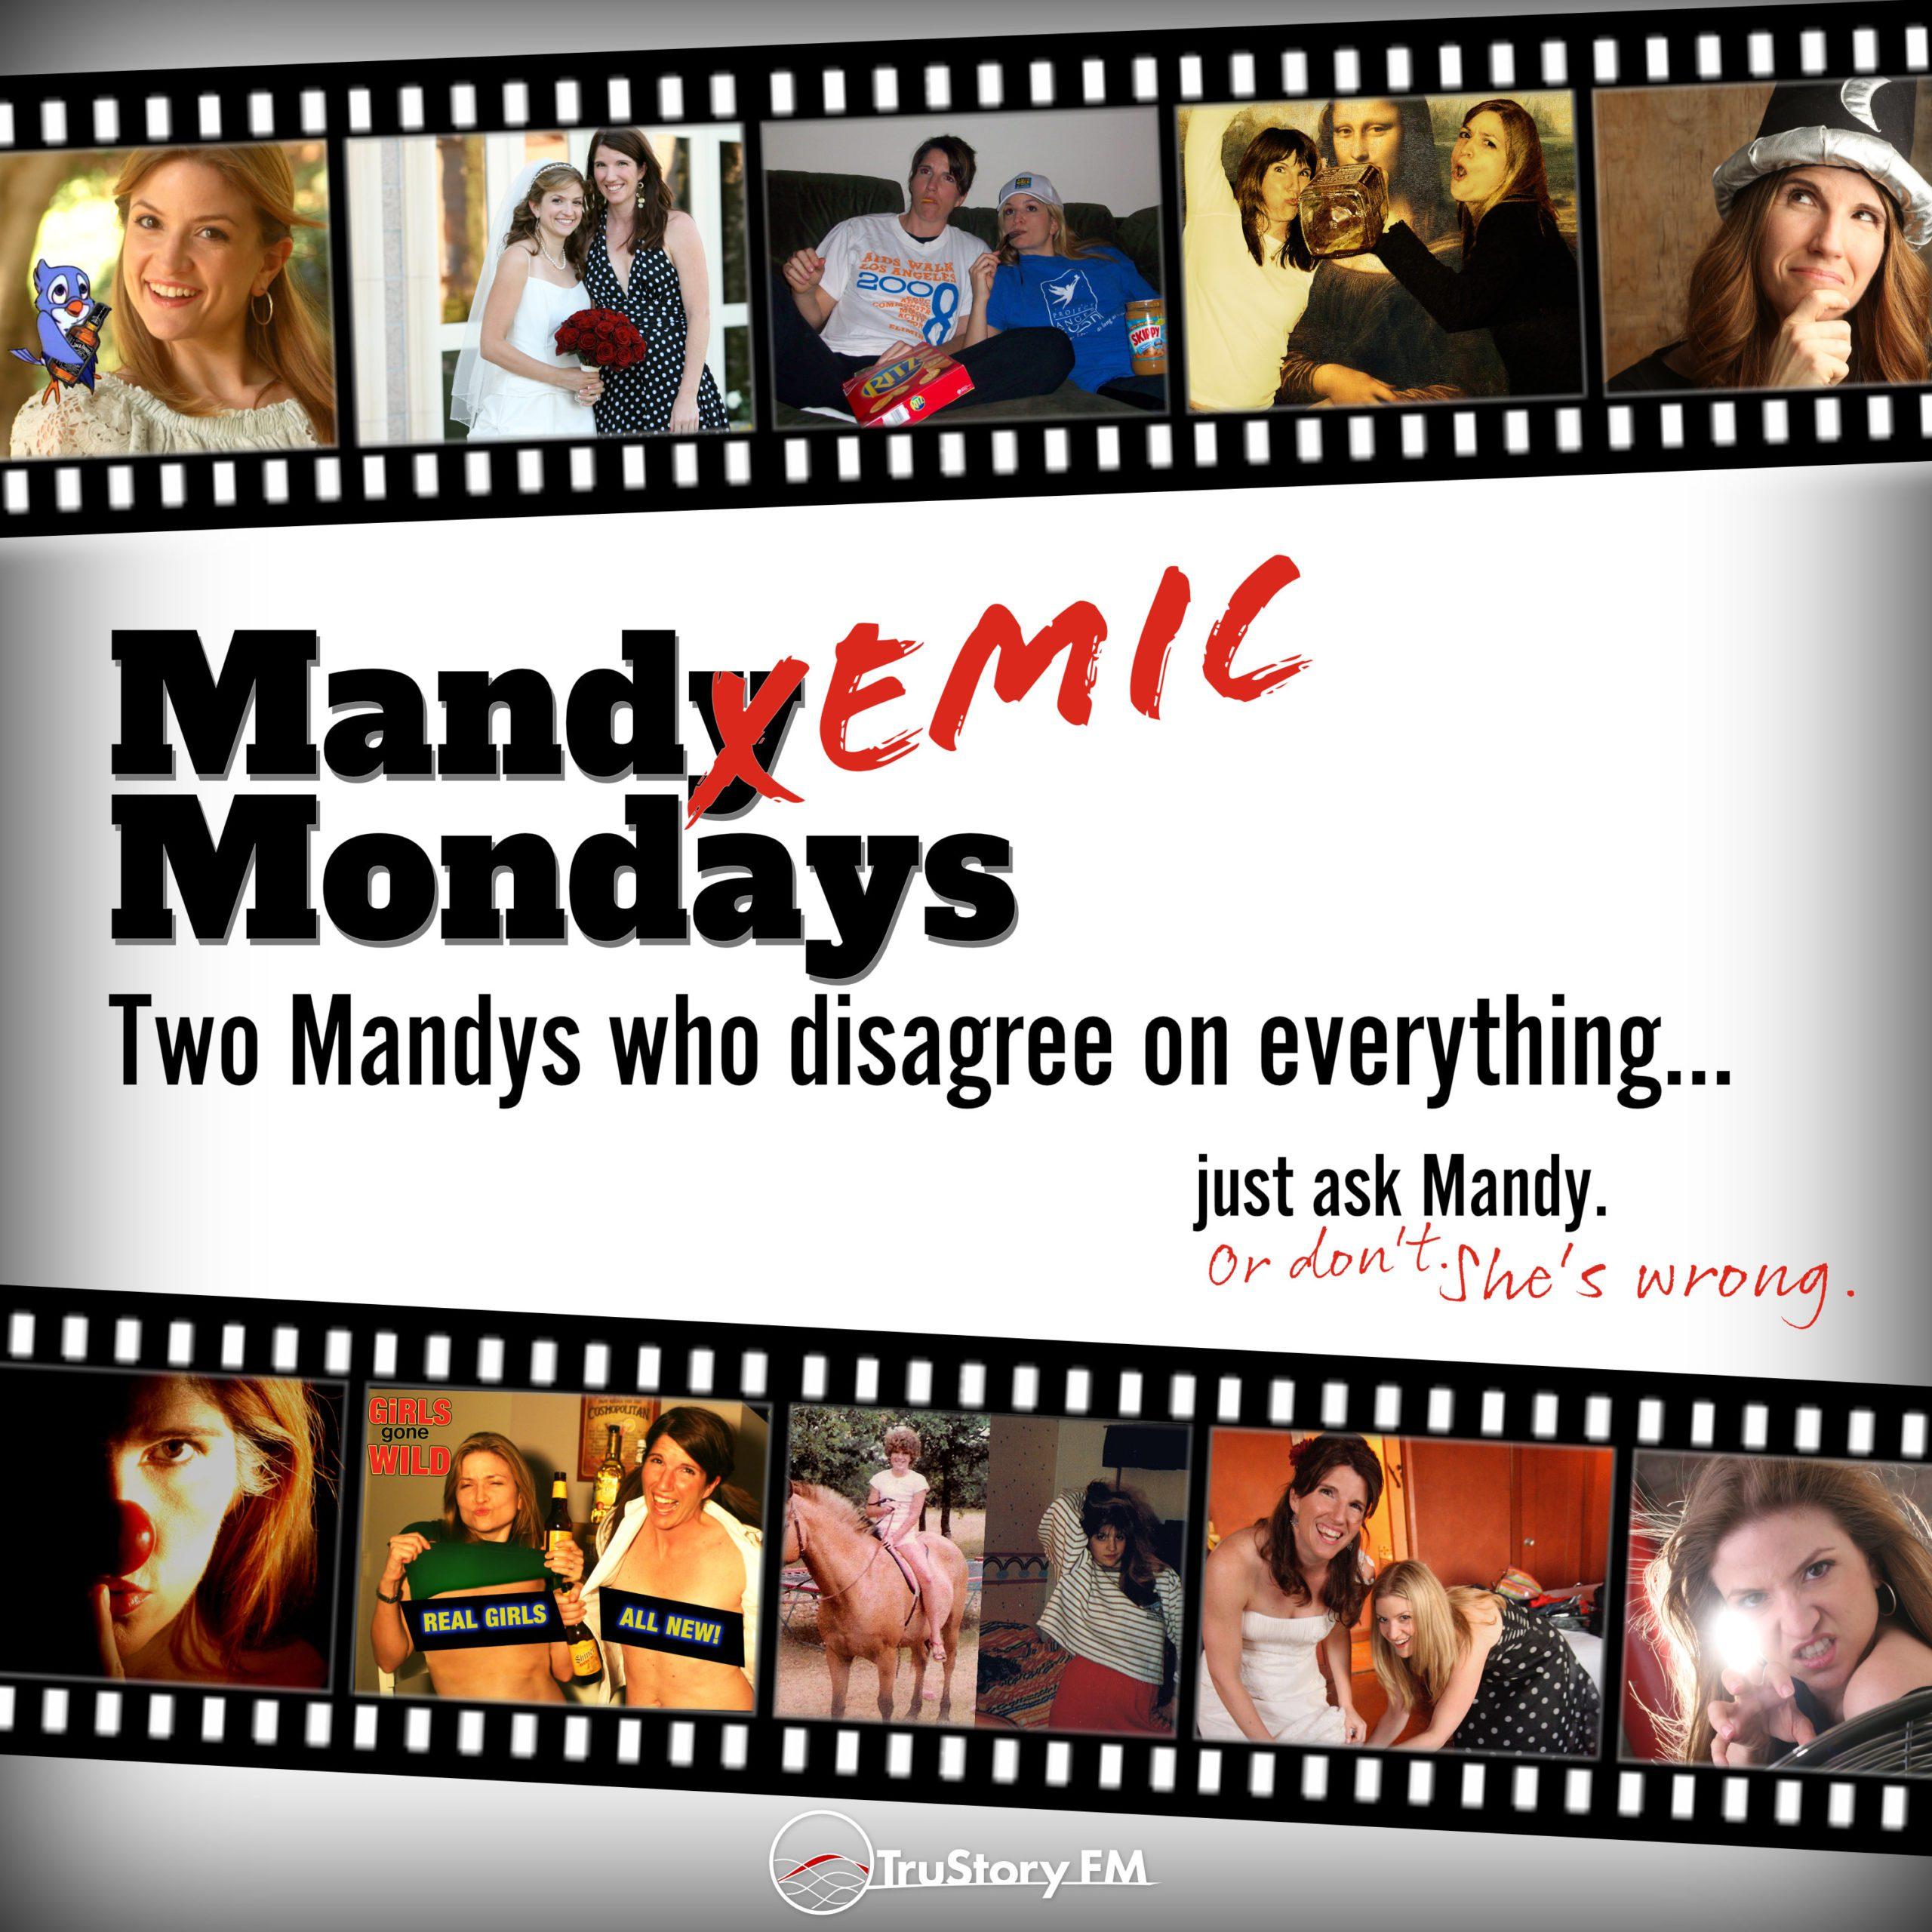 Mandemic Thumb